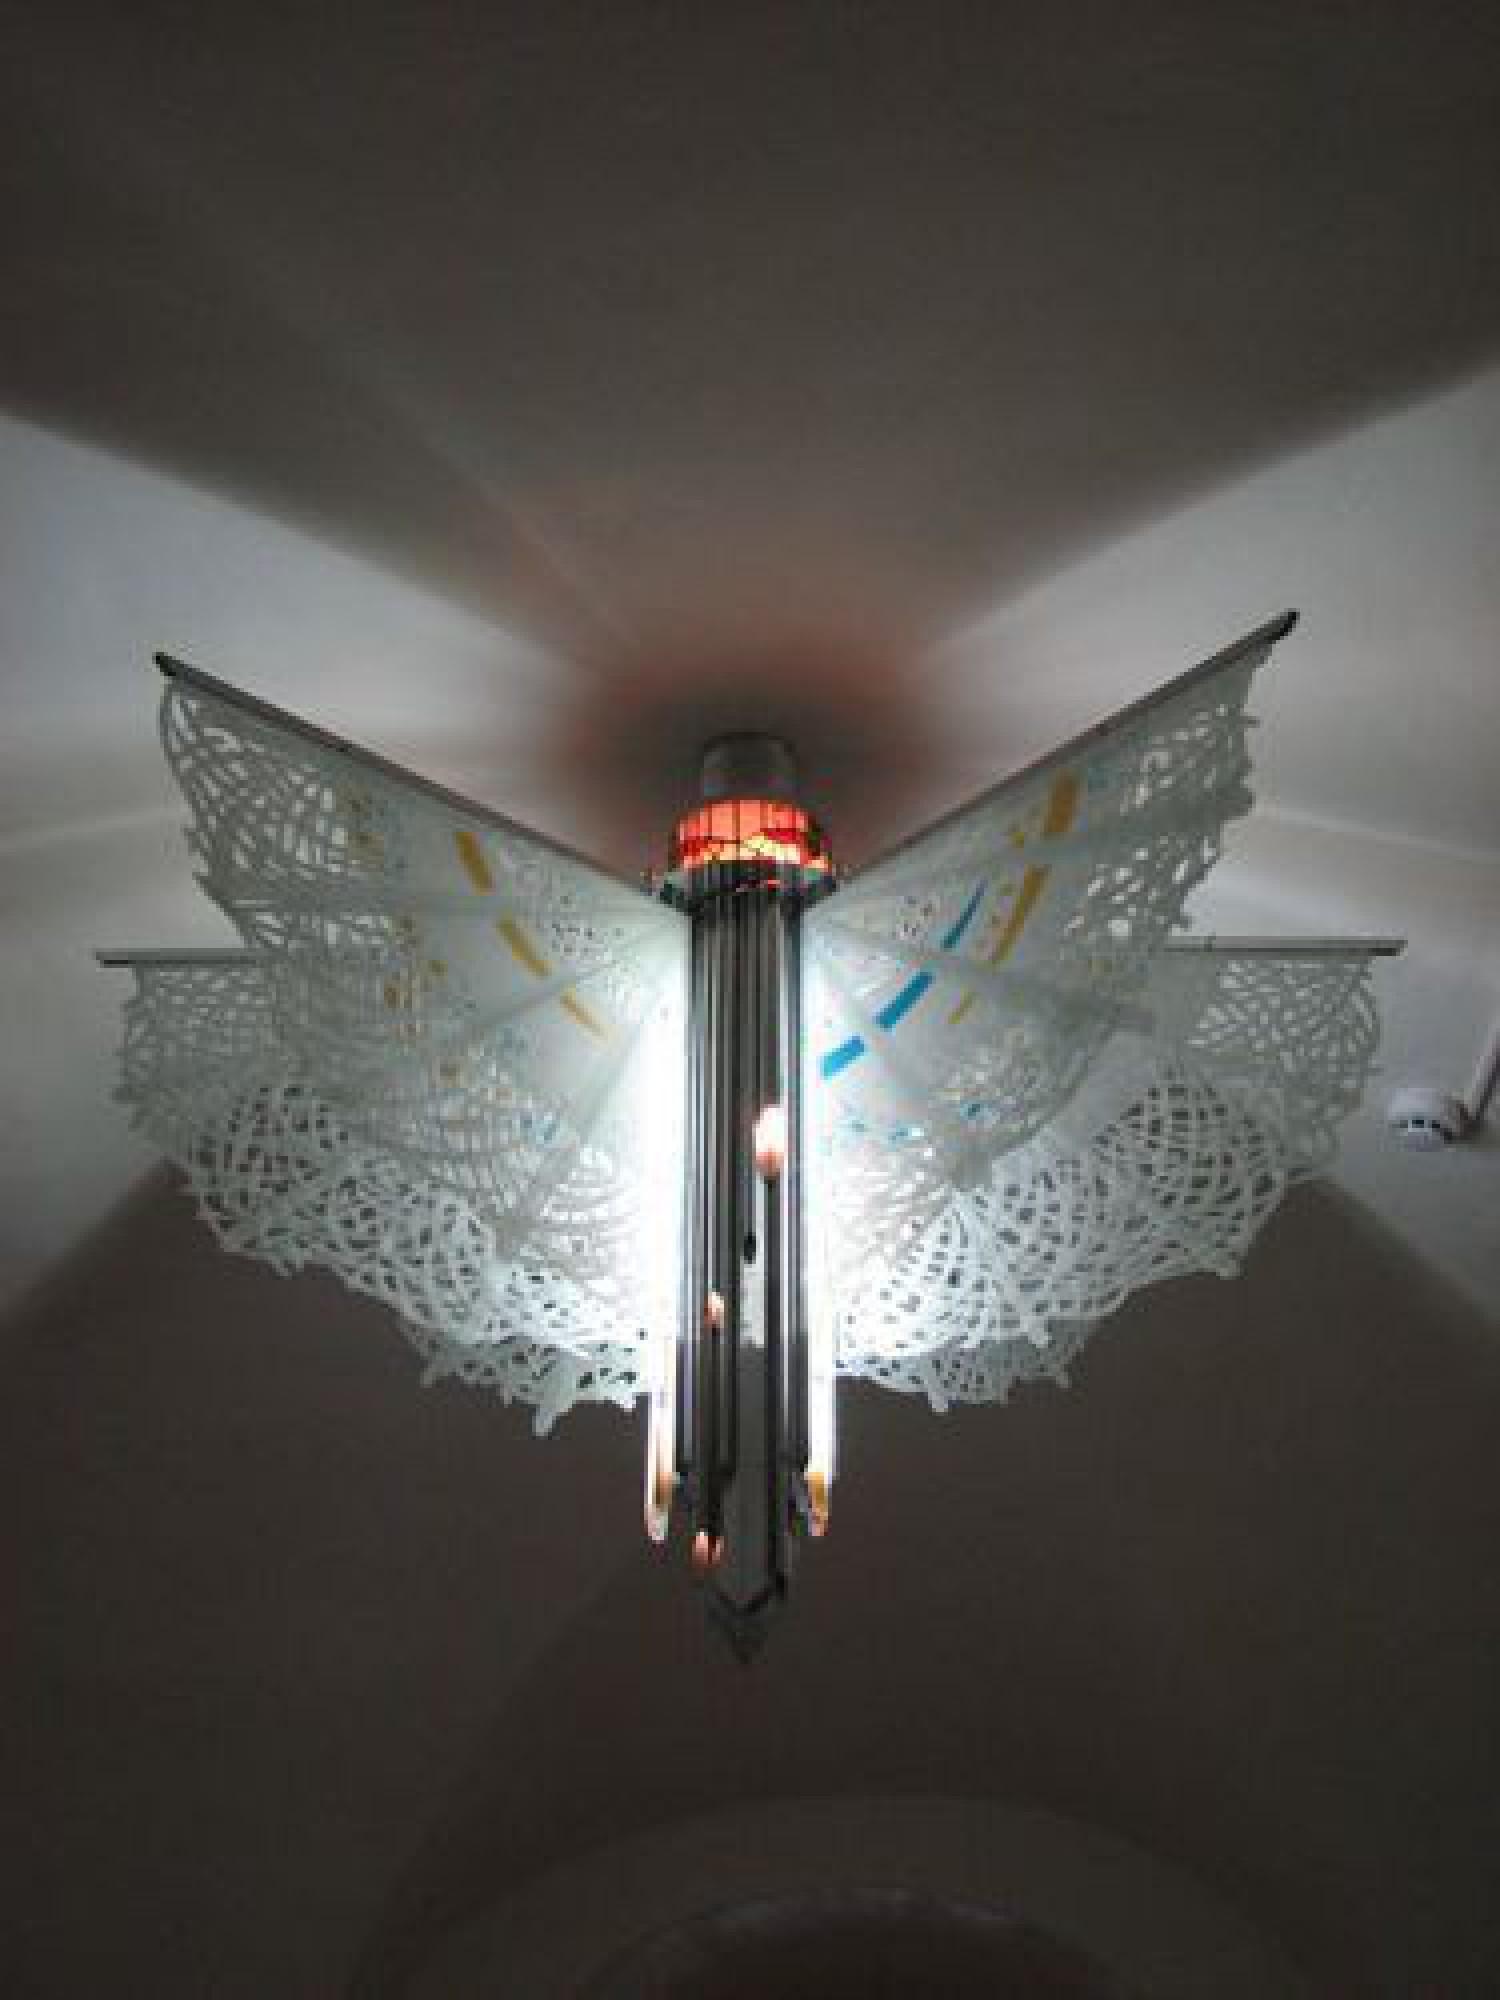 "М.П.Бекетов. Светильник ""Ангел"". 120х120. Стекло, металл. ЯГИАХМЗ. 2006"